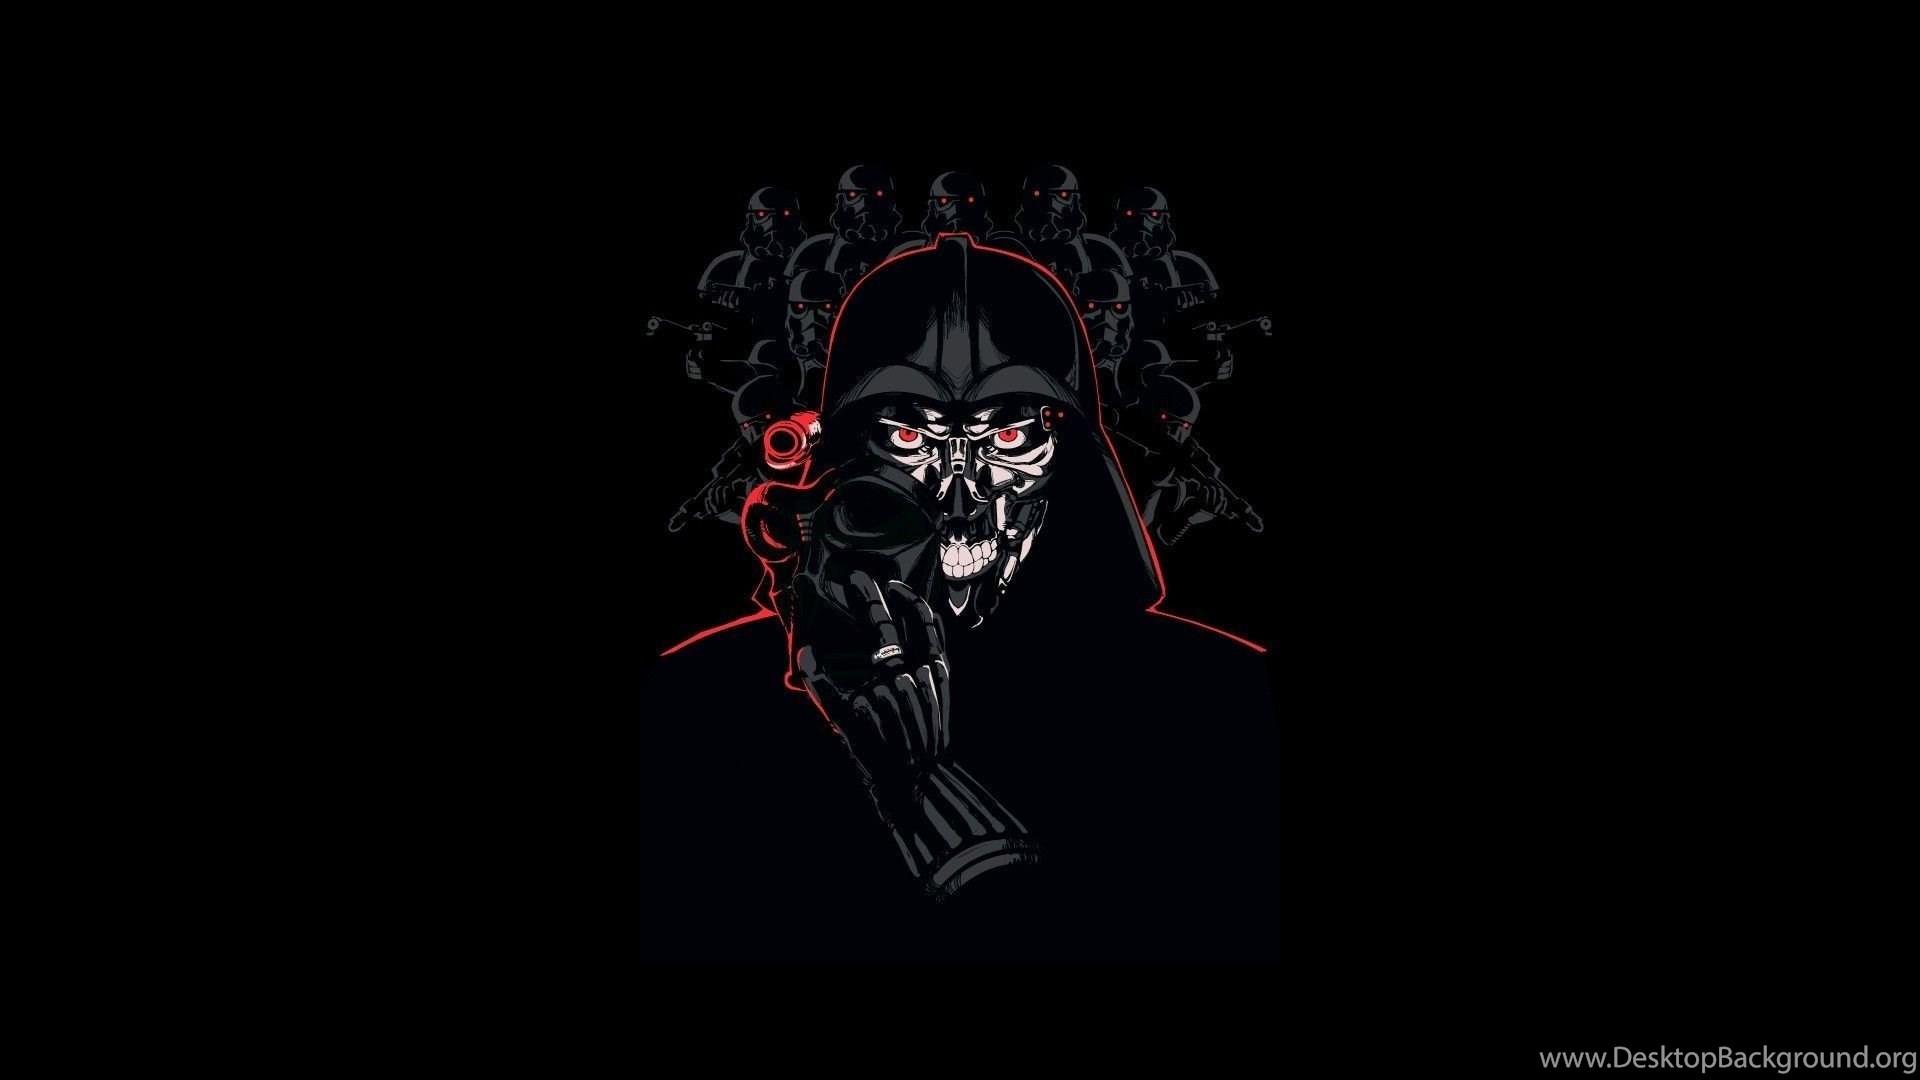 Star Wars Darth Vader Wallpapers Hd Desktop Background